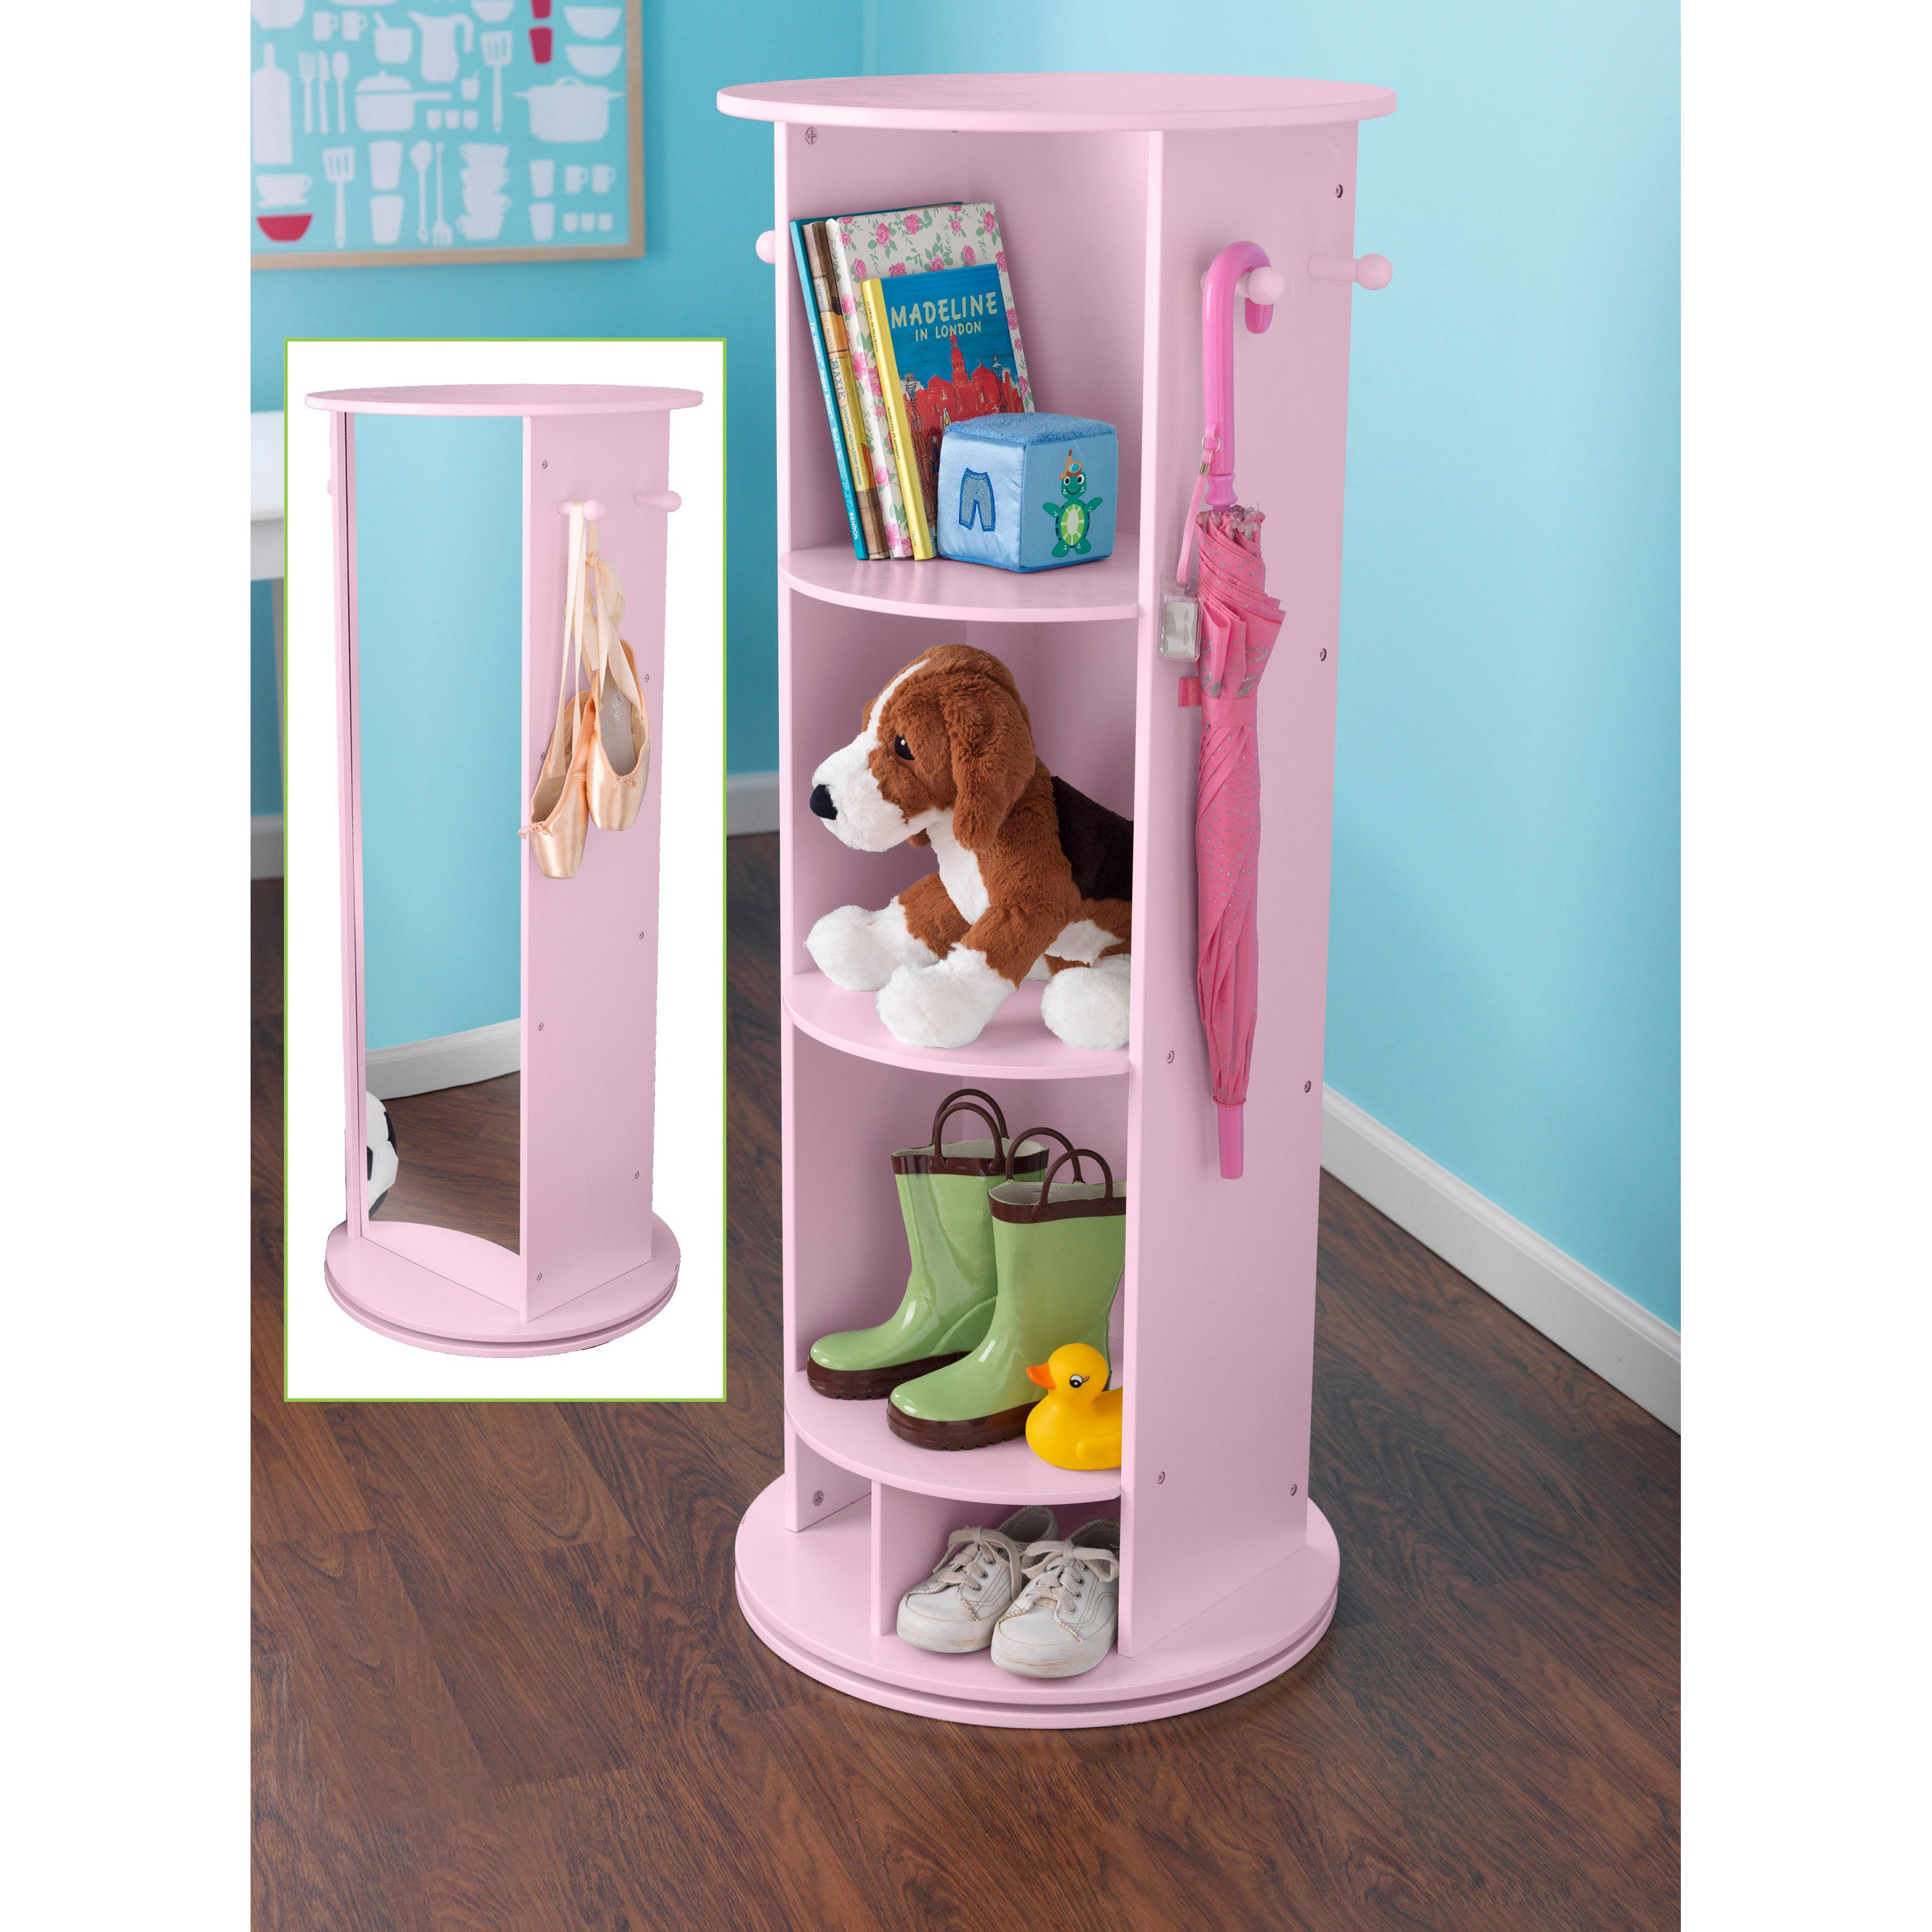 diy vanity for little girl. Mesmerizing Diy Vanity For Little Girl Gallery  Best idea home